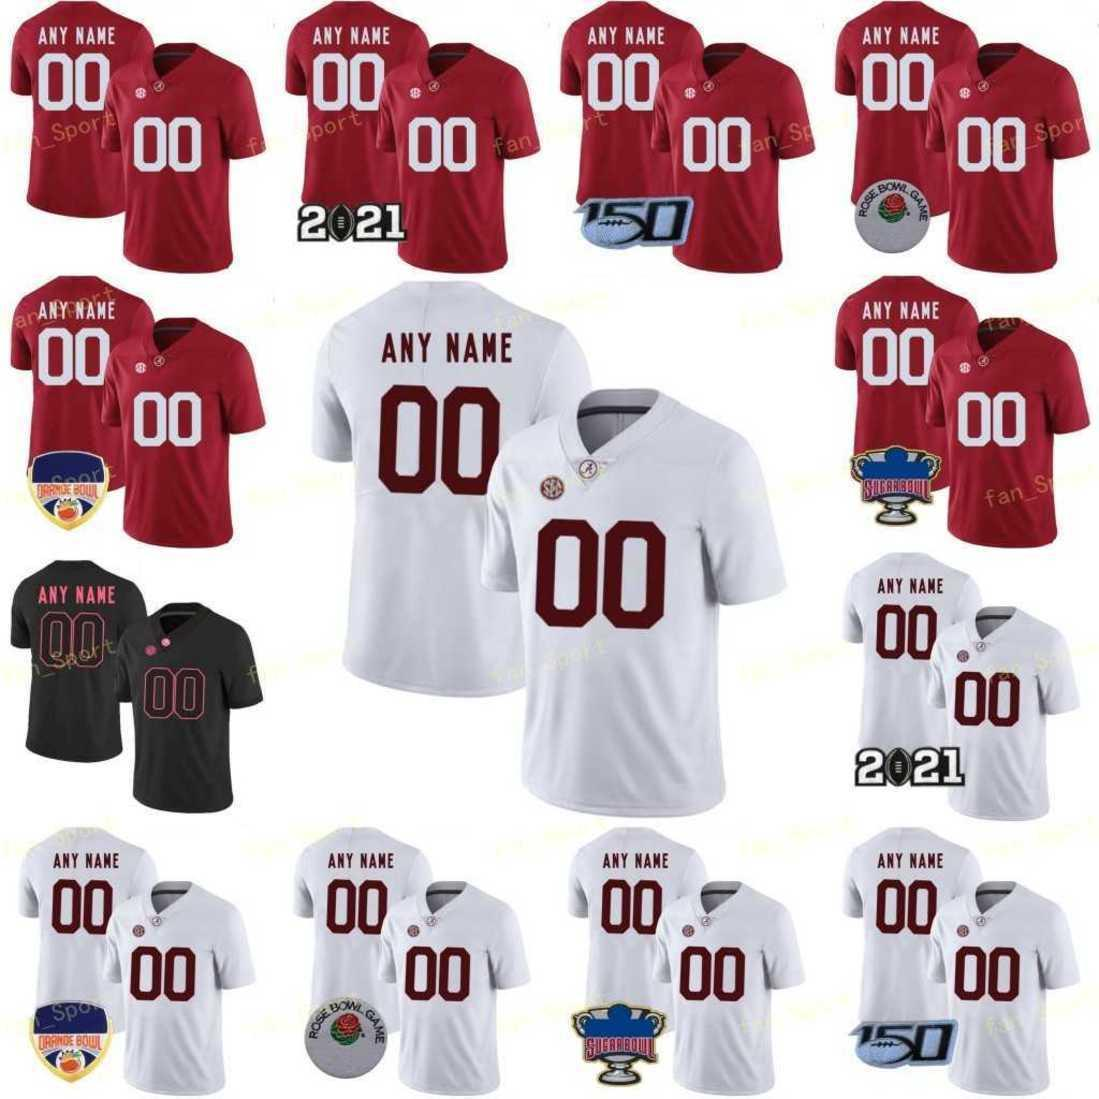 Custom NCAA College Alabama Football Jersey 9 Bryce Young 6 Trey Sanders 4 Brian Robinson Jr. 65 JC Latham 76 Brockermeyer 73 Evan Neal